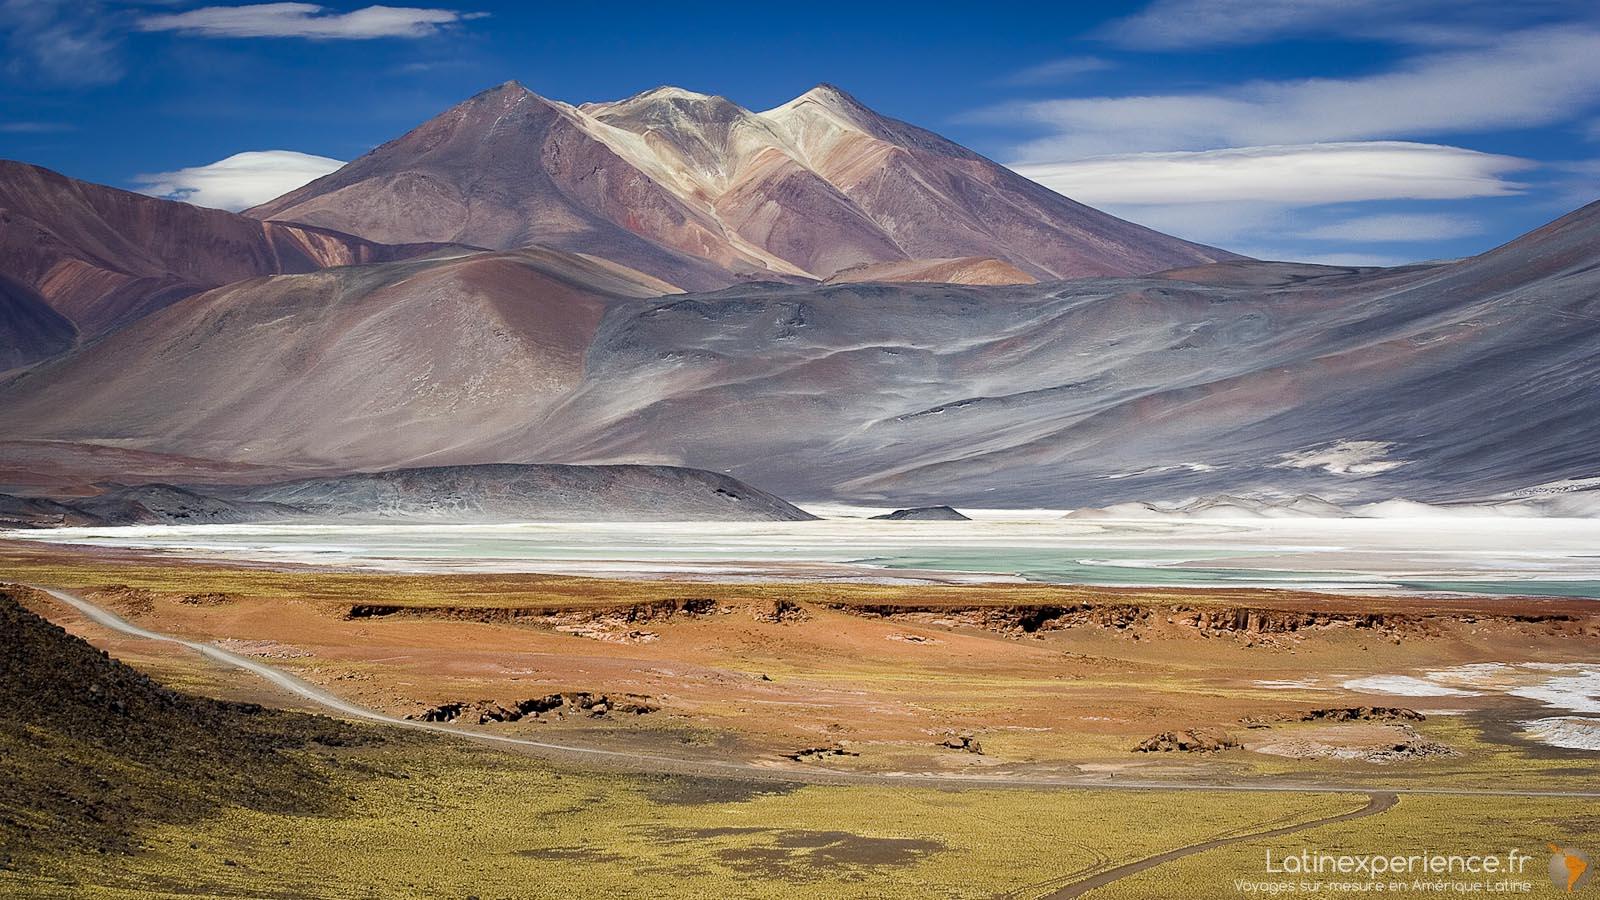 Chili - San Pedro de Atacama - Latinexperience voyages